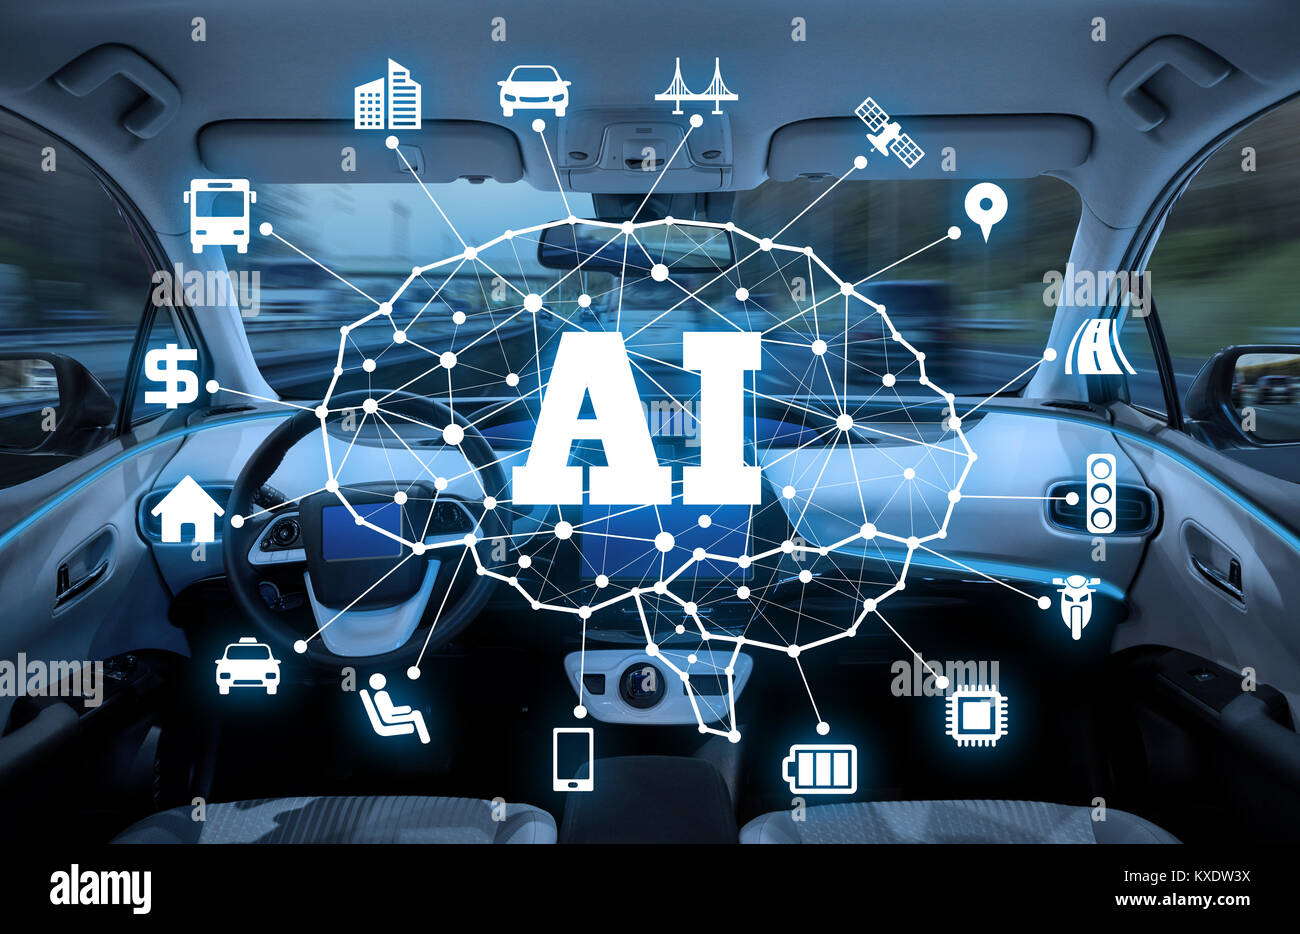 autonomous car with AI(Artificial Intelligence) concept. - Stock Image